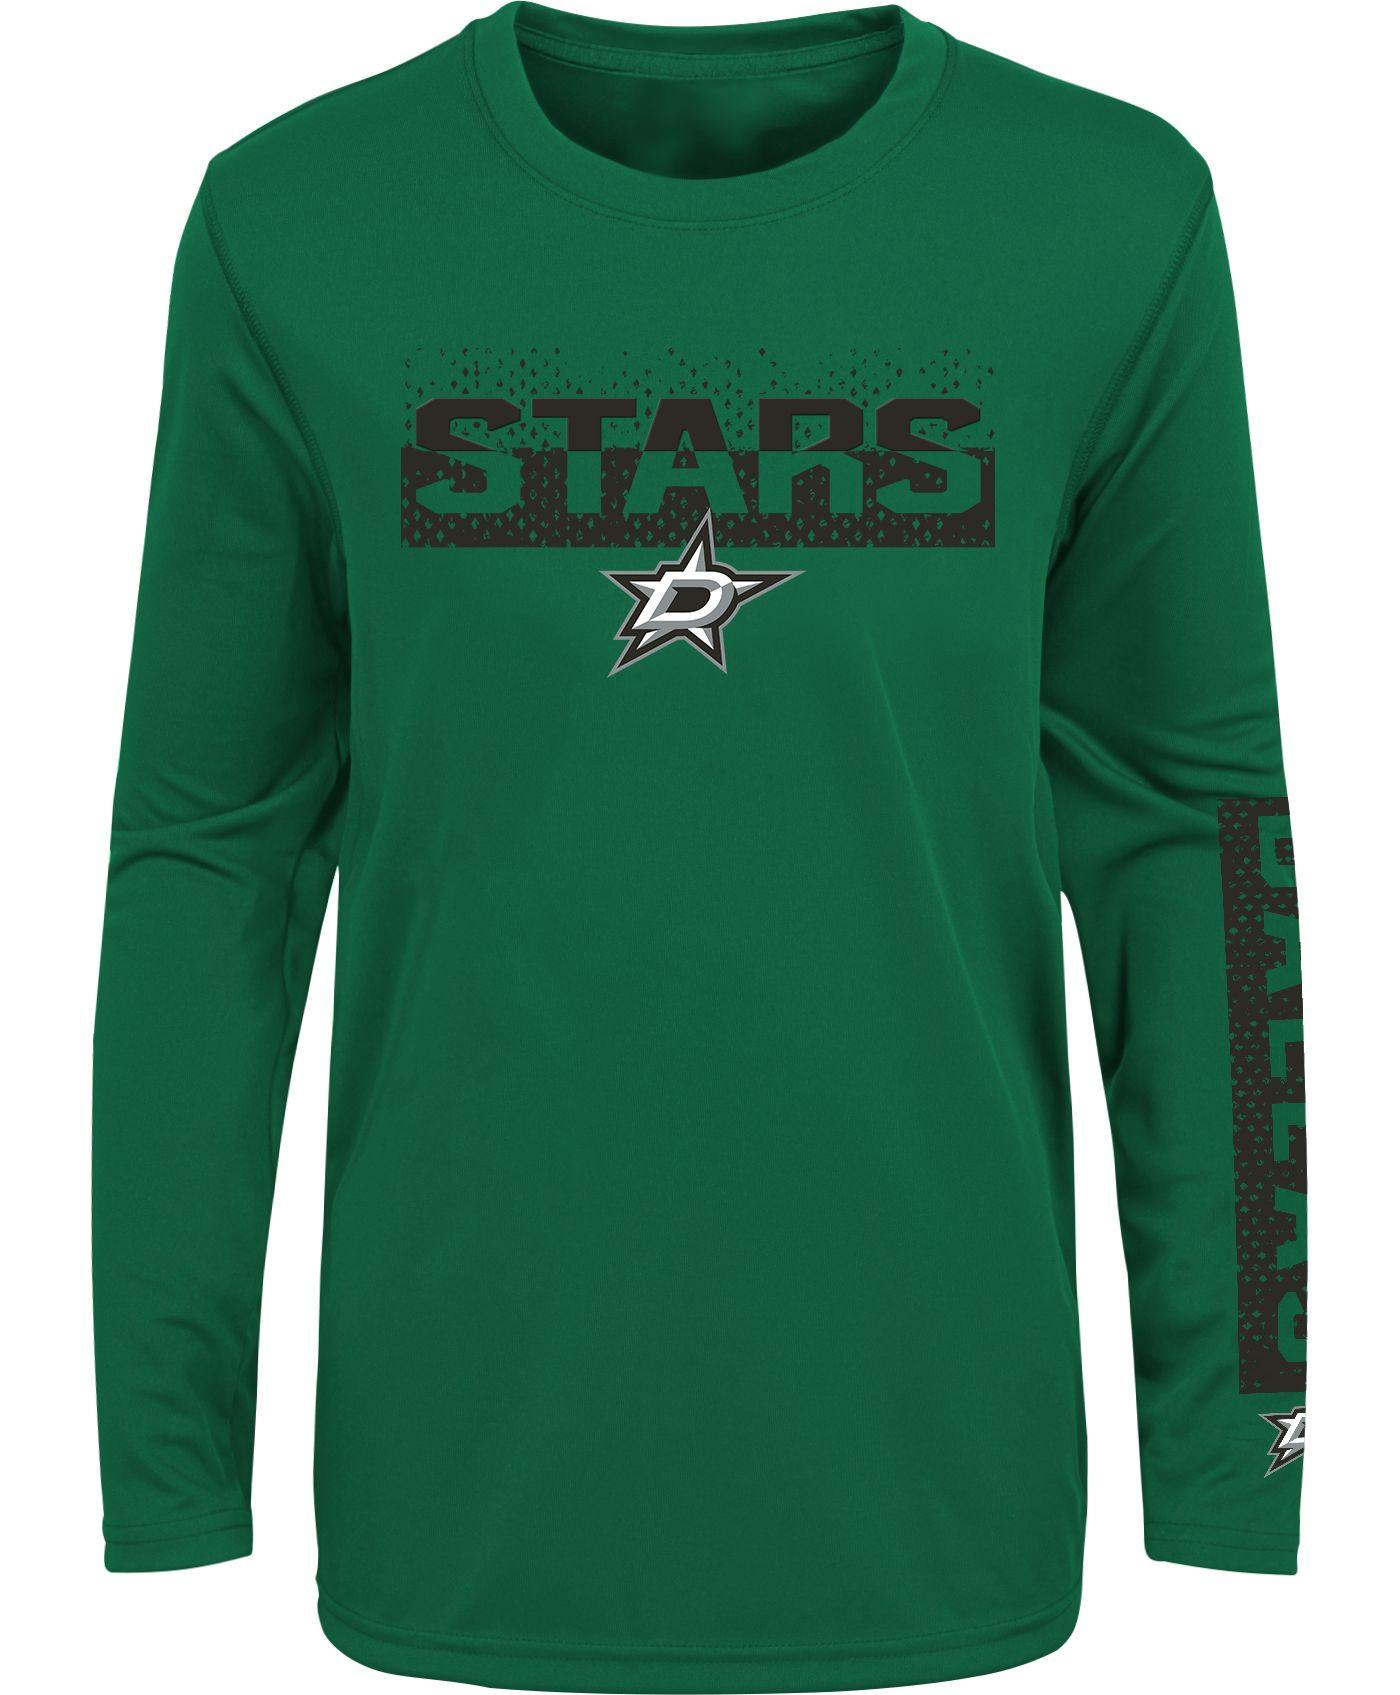 NHL Youth Dallas Stars Slap Shot Green Long Sleeve Shirt